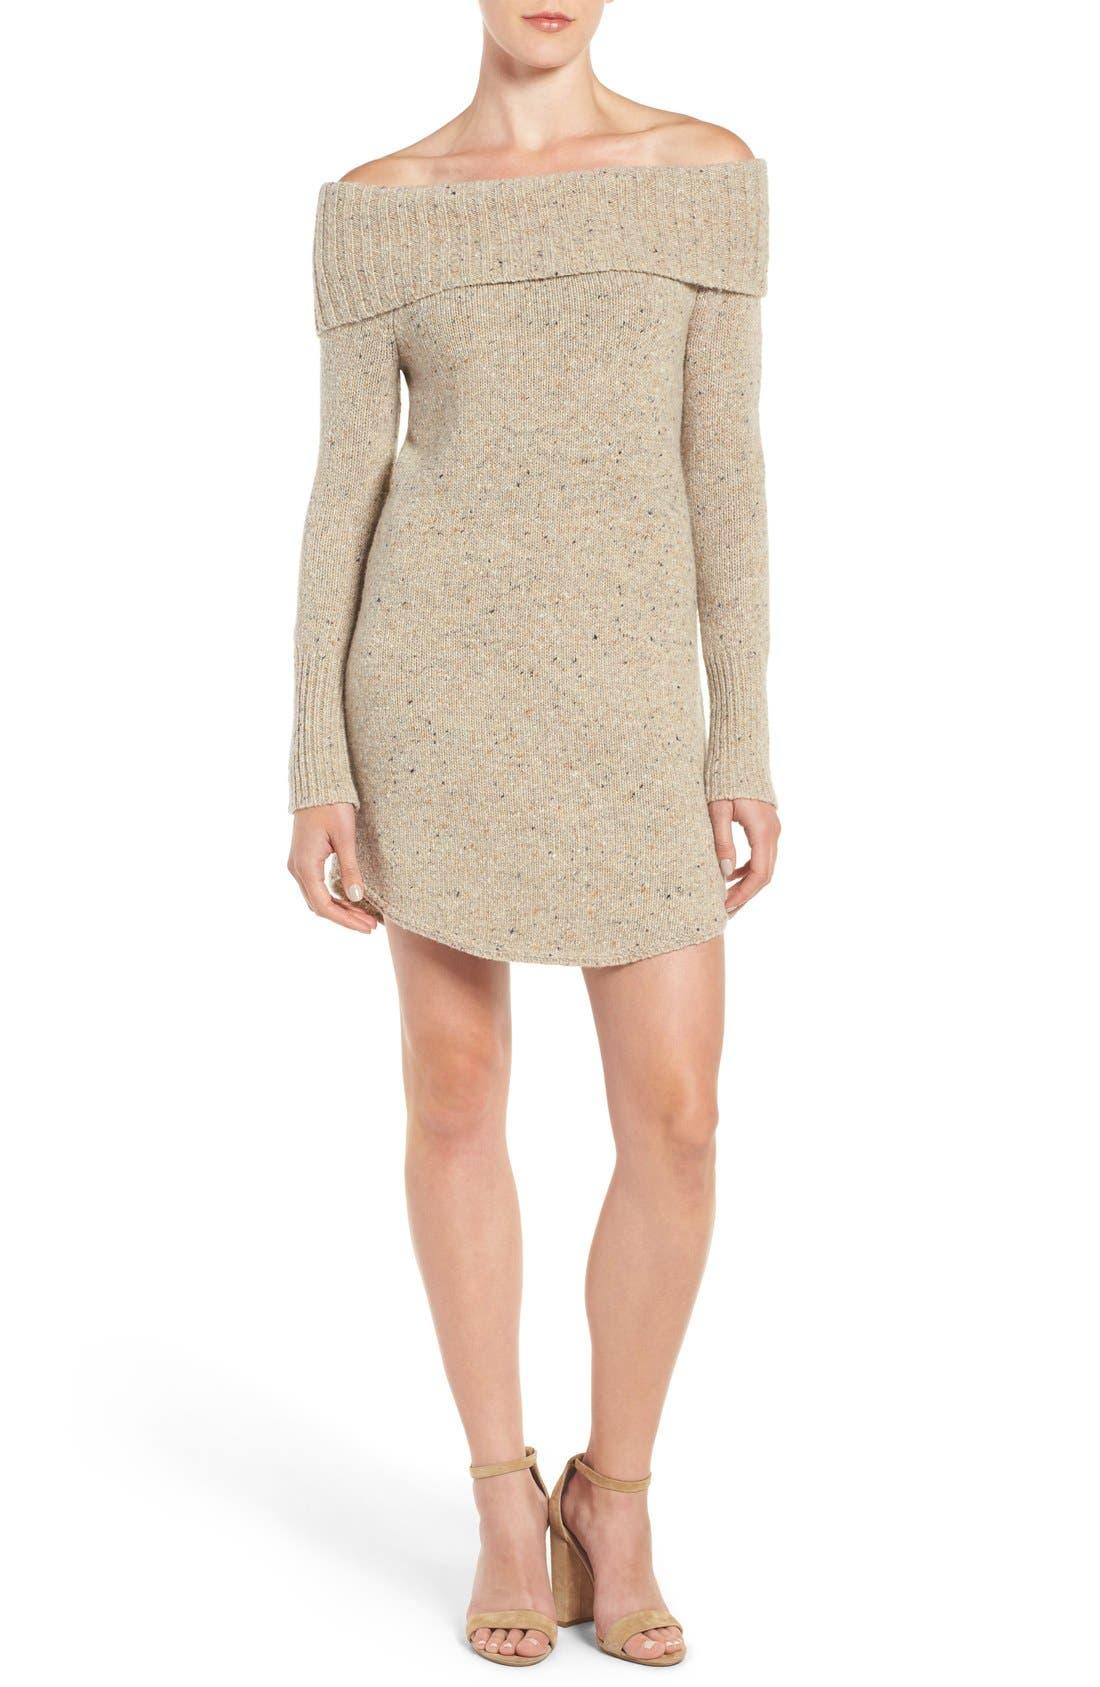 Alternate Image 1 Selected - Rebecca Minkoff Erid Off the Shoulder Sweater Dress